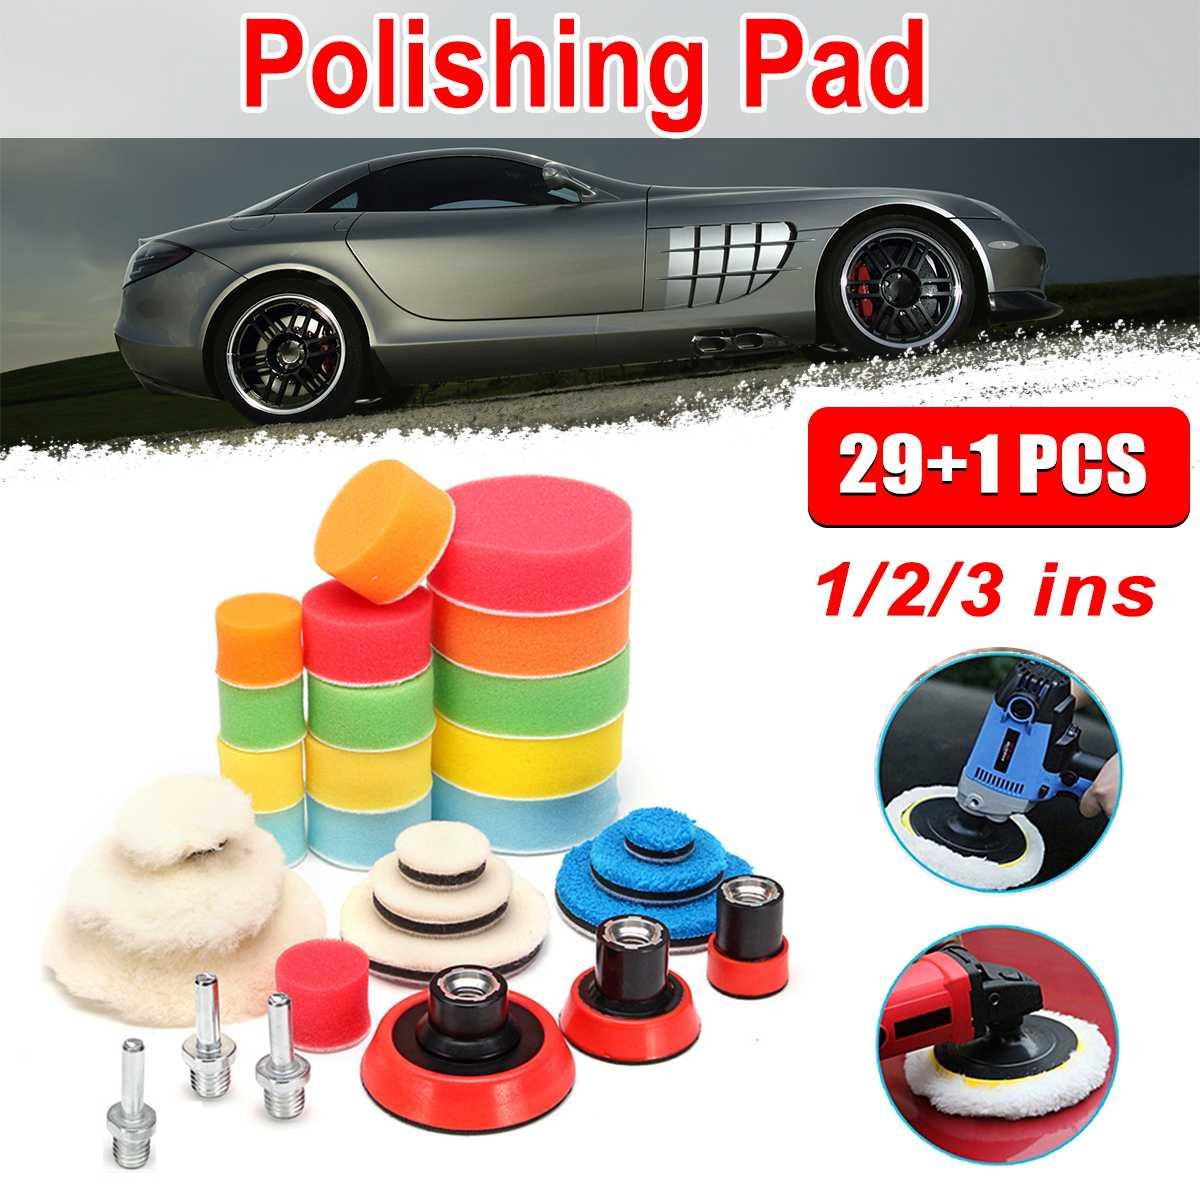 29Pcs Buffing Pad Set with M14 Thread 1-3 inch Auto Car Polishing Pad Kit for Car Polisher + Drill Adaptor M14 Power Tools Acc